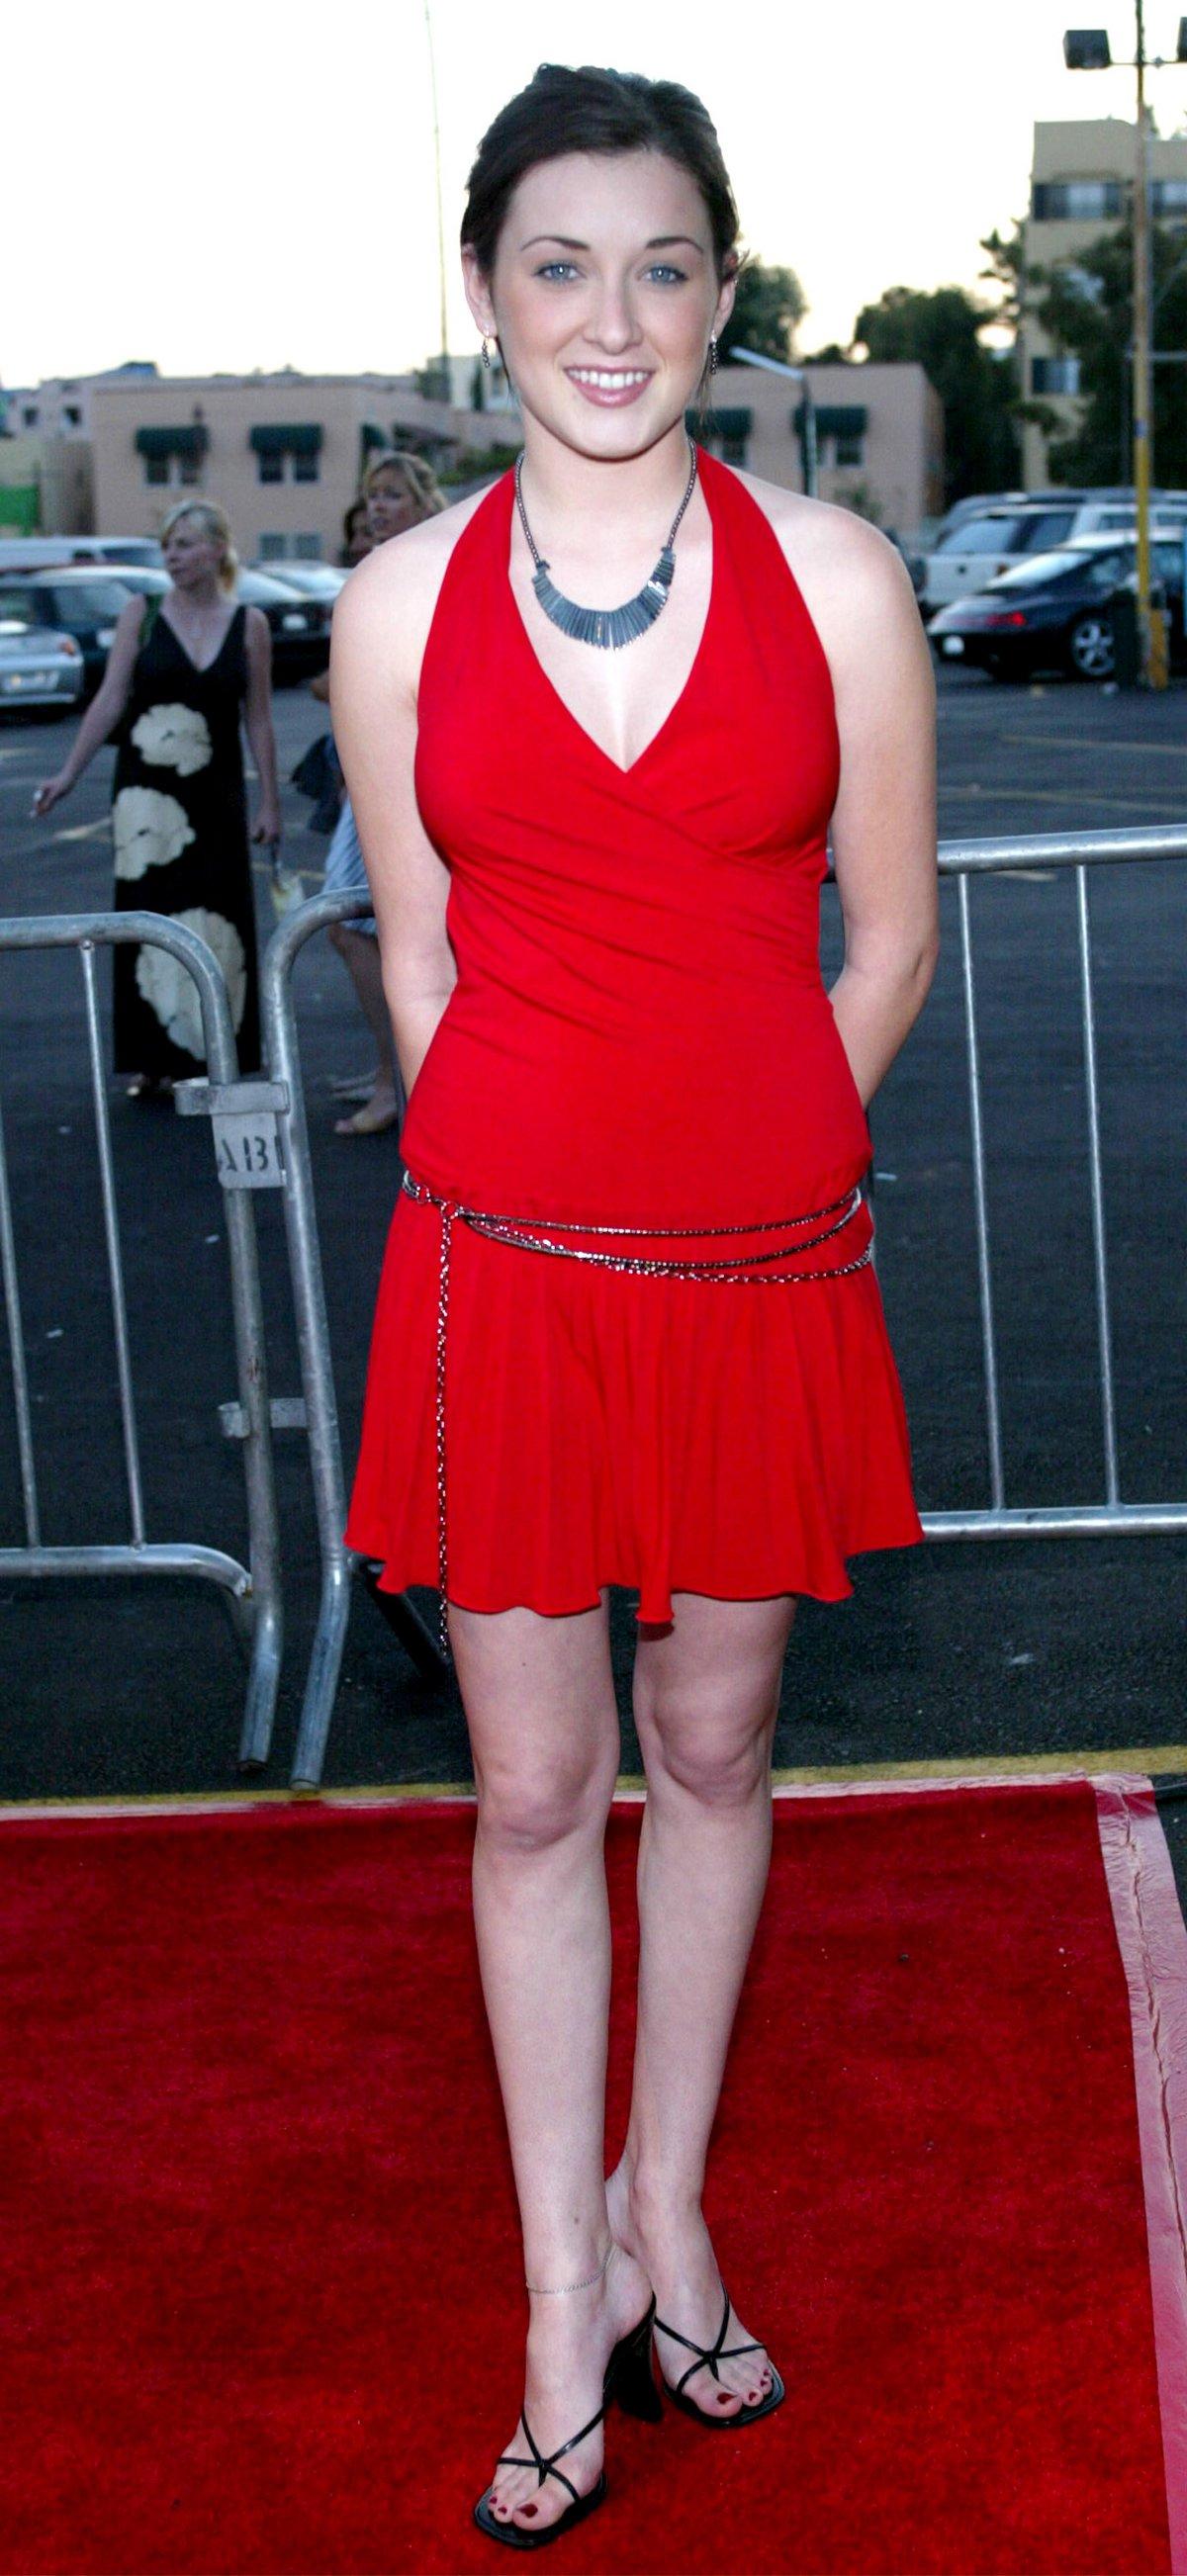 Lilian Fontaine,Sarah Kennedy (actress) Erotic video Janet Hubert,Carolyn Jones